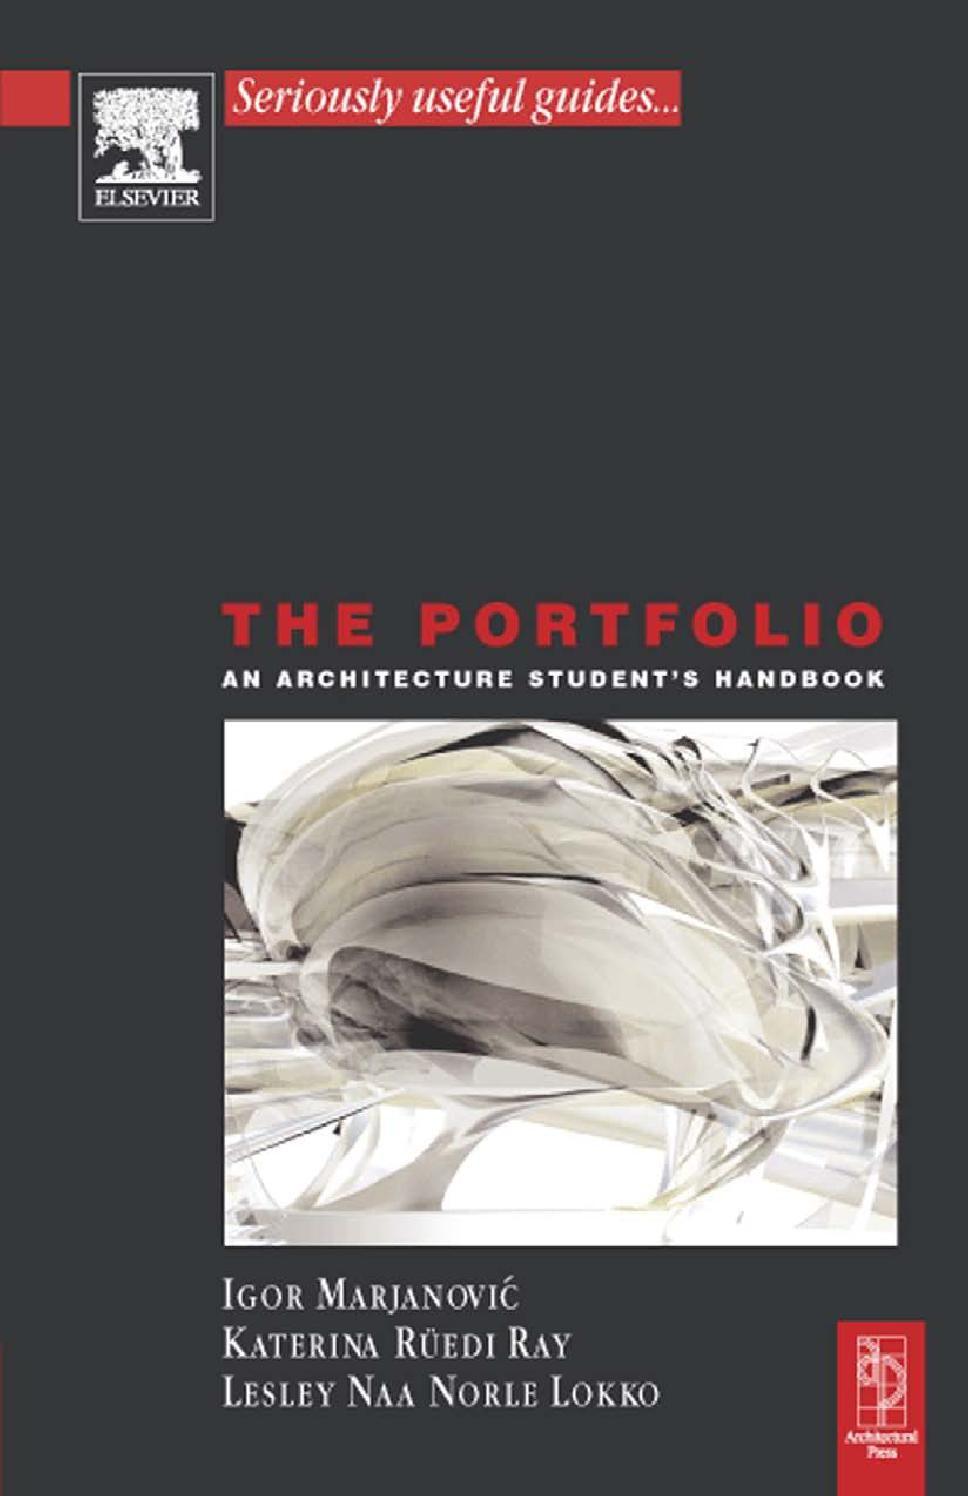 Architecture ebook the portfolio an architecture students handbook architecture ebook the portfolio an architecture students handbook fandeluxe Choice Image